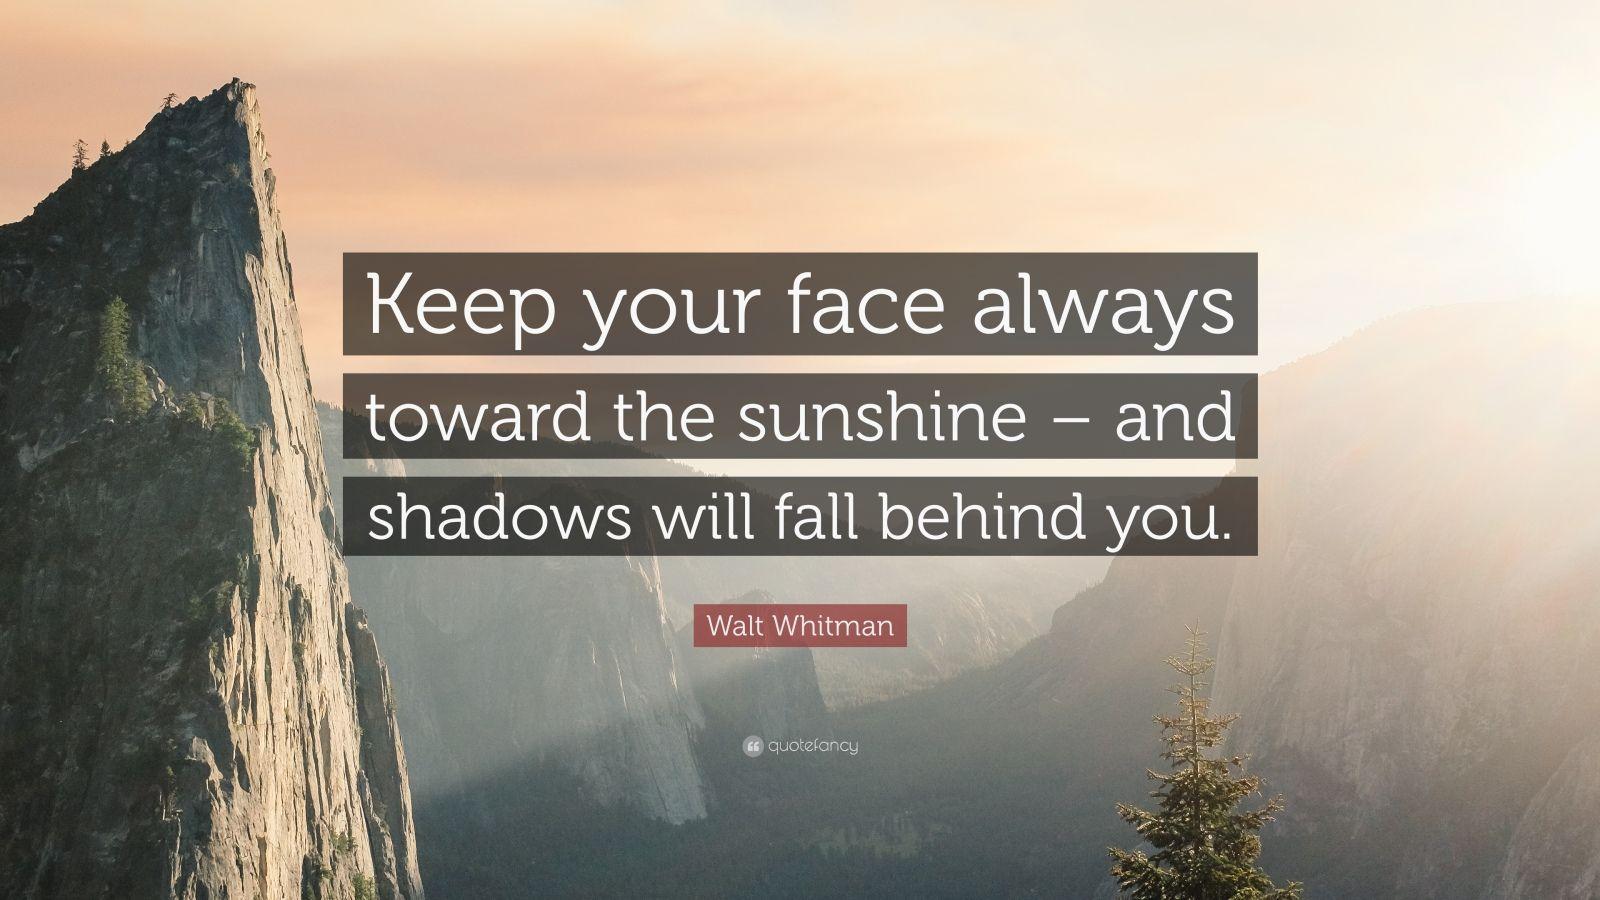 Aristotle Quotes Wallpaper Walt Whitman Quotes 12 Wallpapers Quotefancy